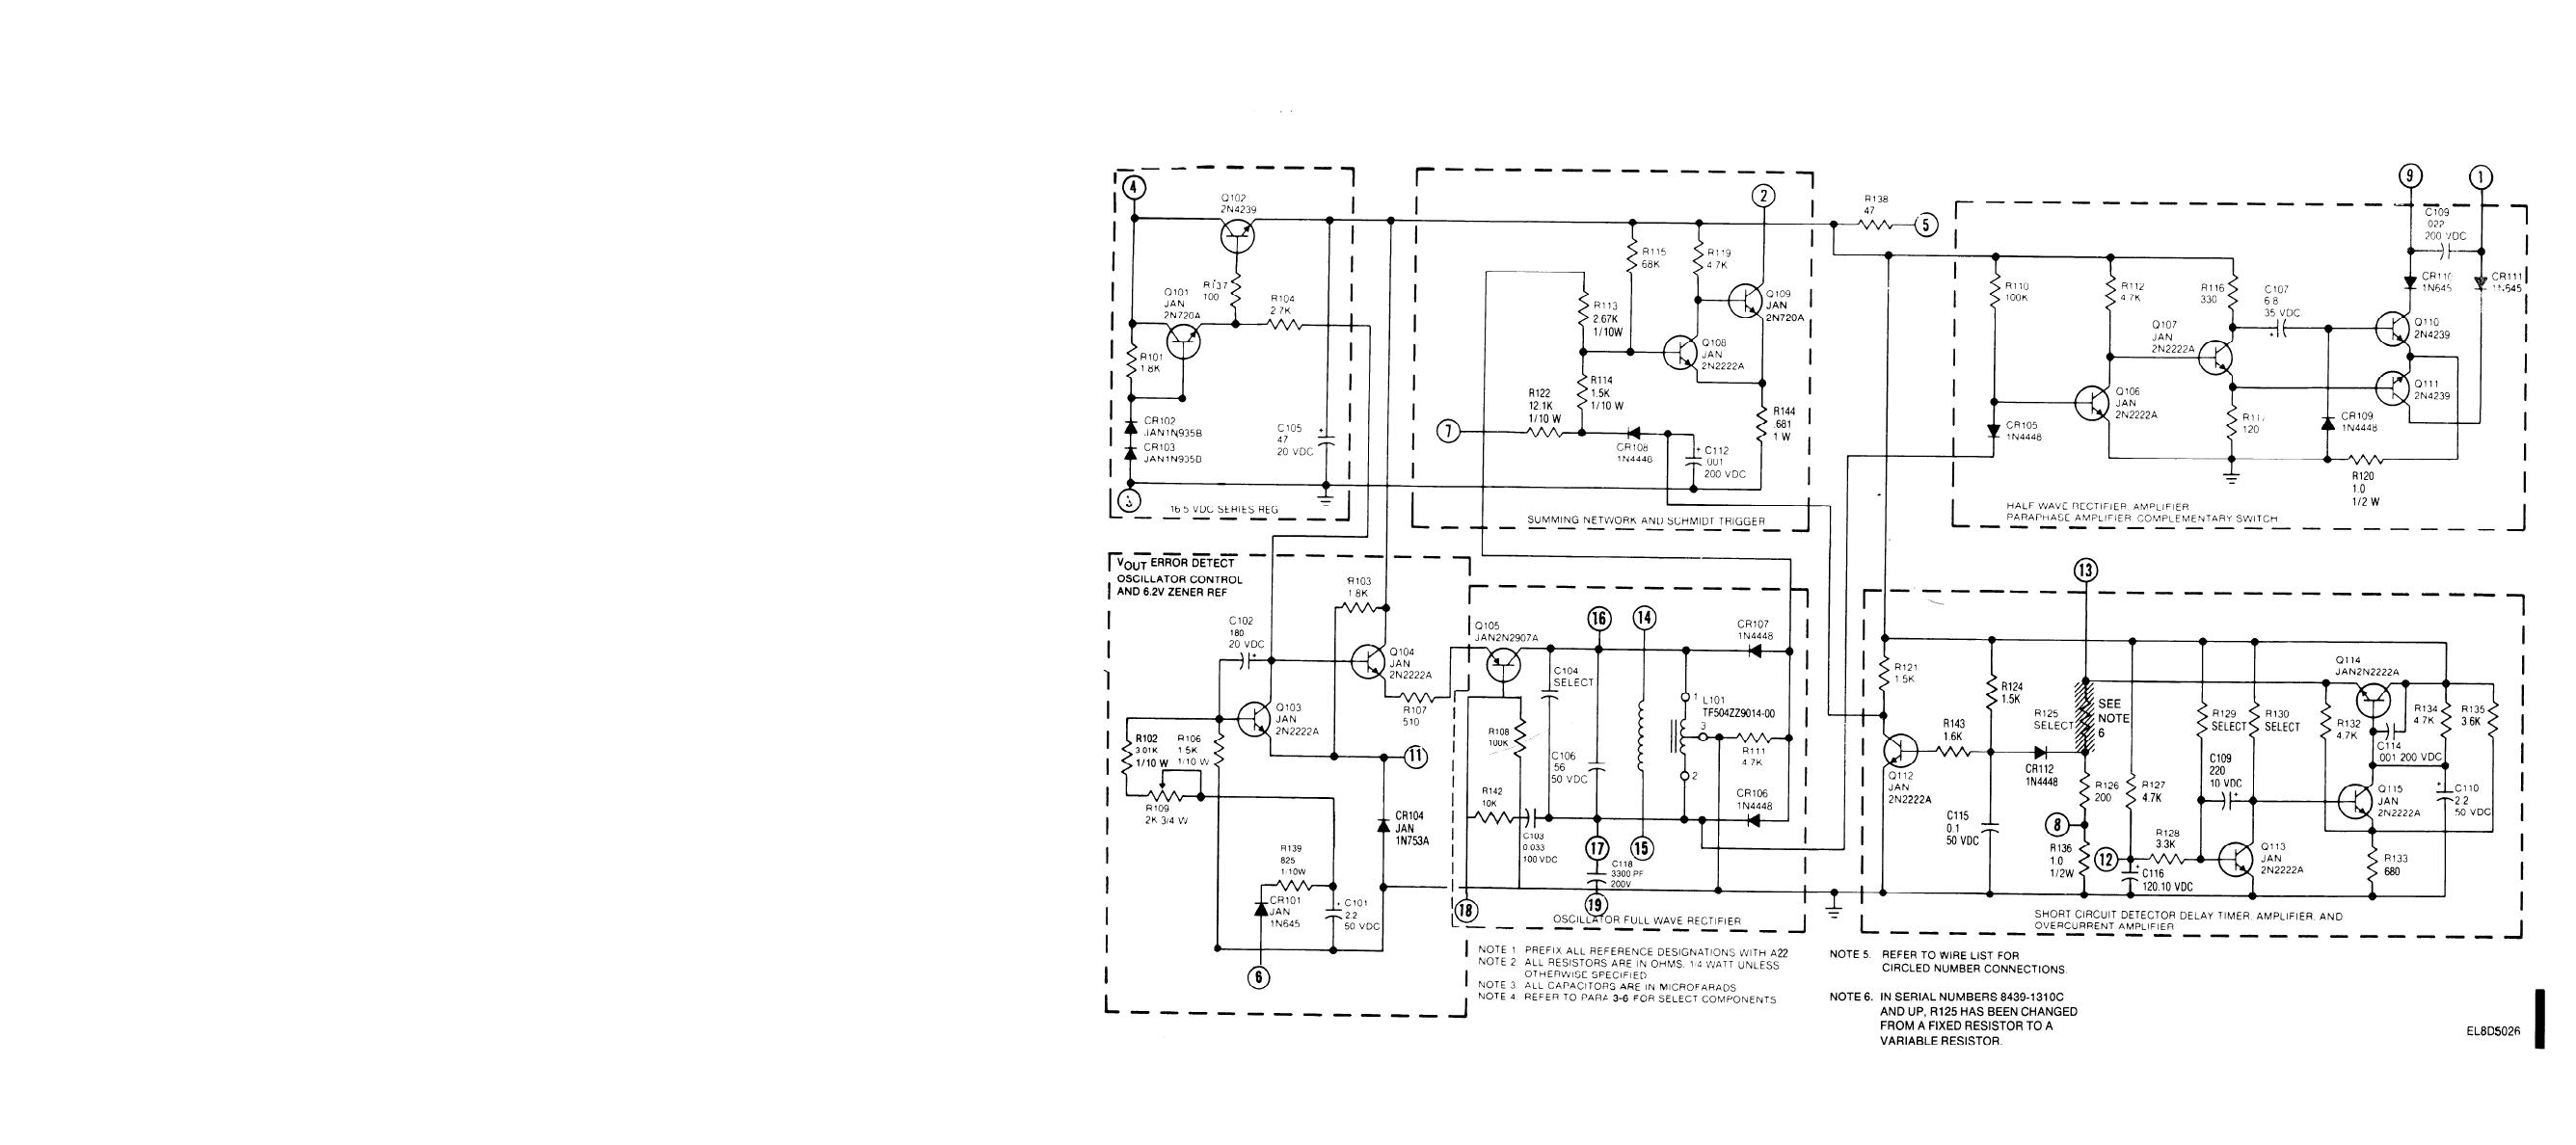 Figure Fo 3 Phase A Schematic Diagram